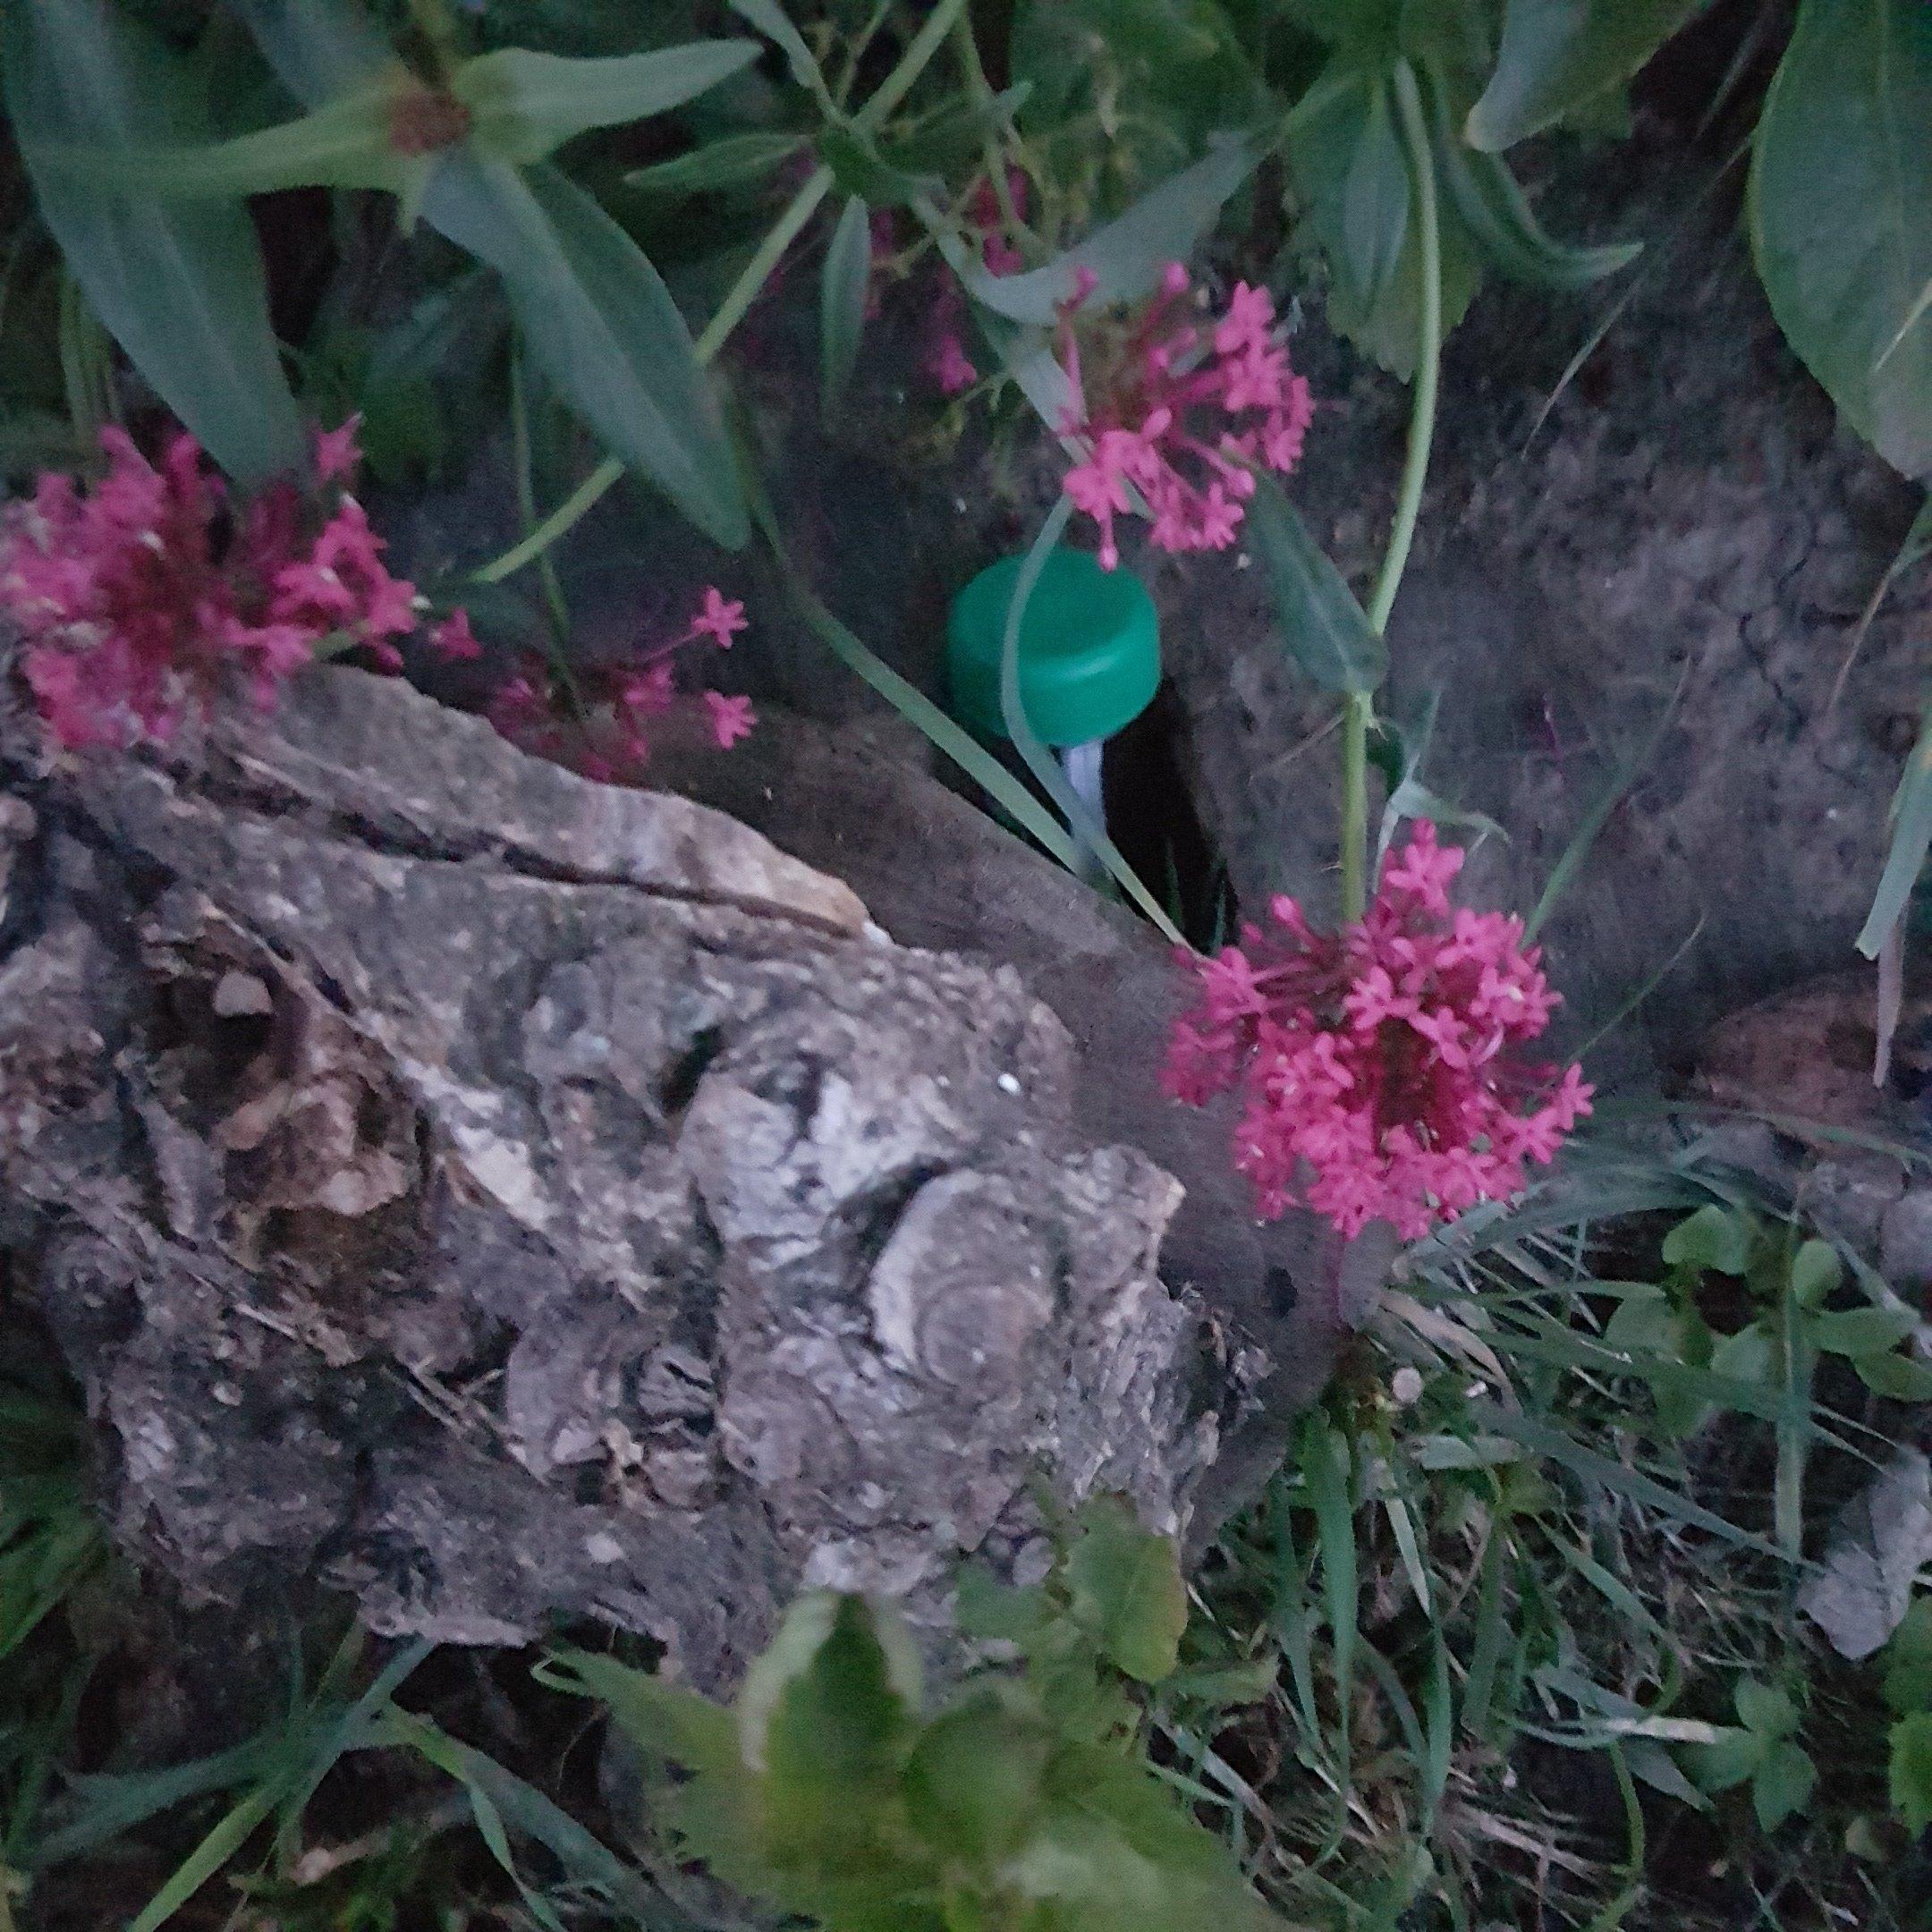 The geocache hiding behind - itstartswithacoffee.com #geocache #geocaching #geocachingNL #geocachingNetherlands #petling #PETpreform